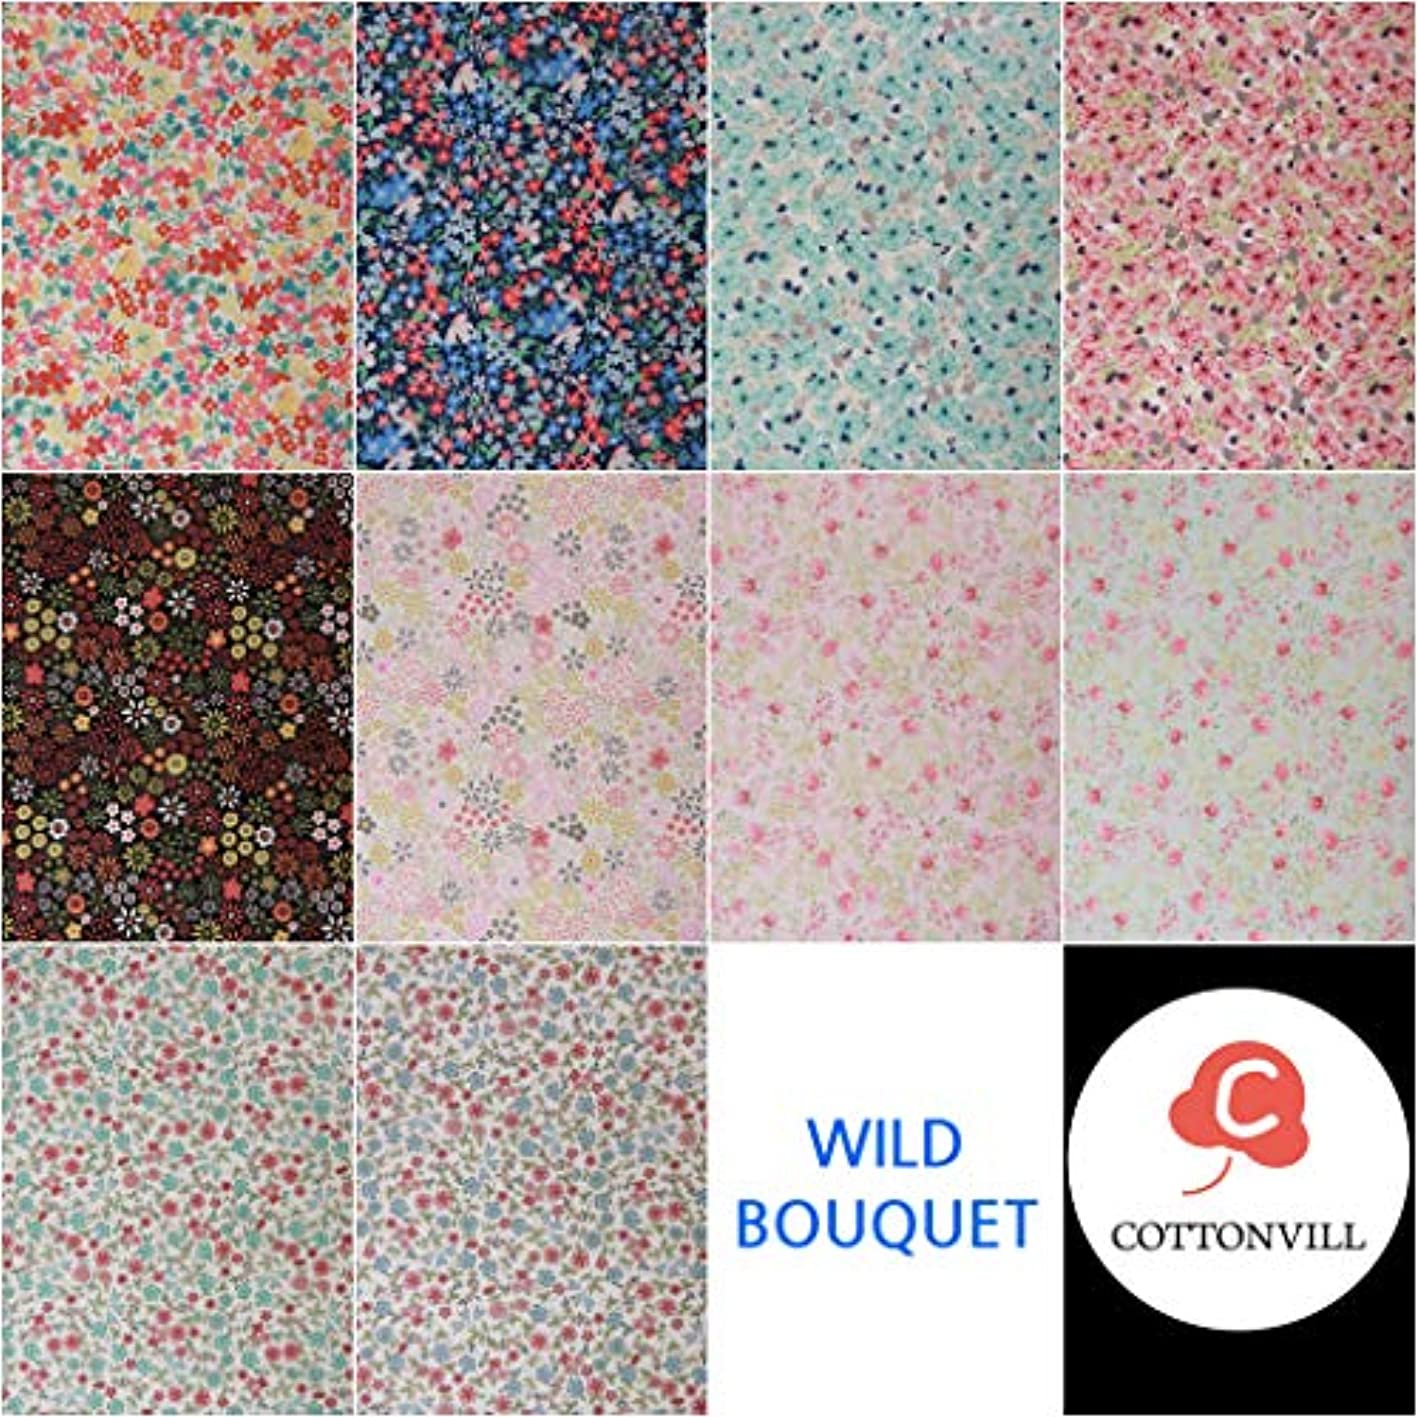 COTTONVILL Fat Quarter Bundle 10pcs Beautiful Flowers Pattern Quilting Fabric (Wild Bouquet) ryzorhxhlpi496